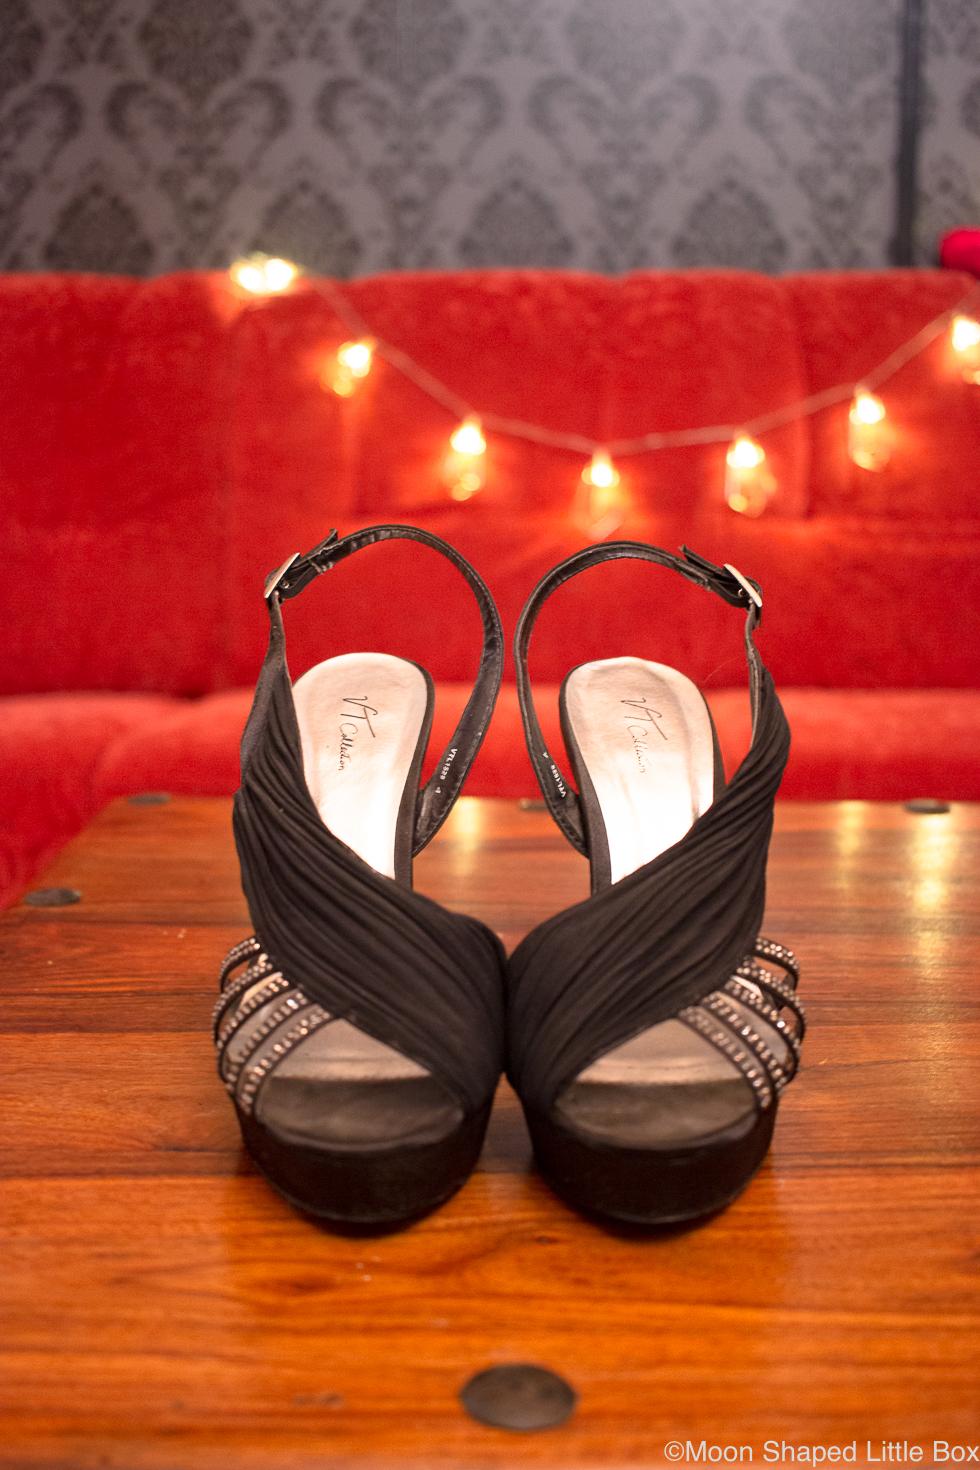 Kenkajoulukalenteri-VT-collection-shoes